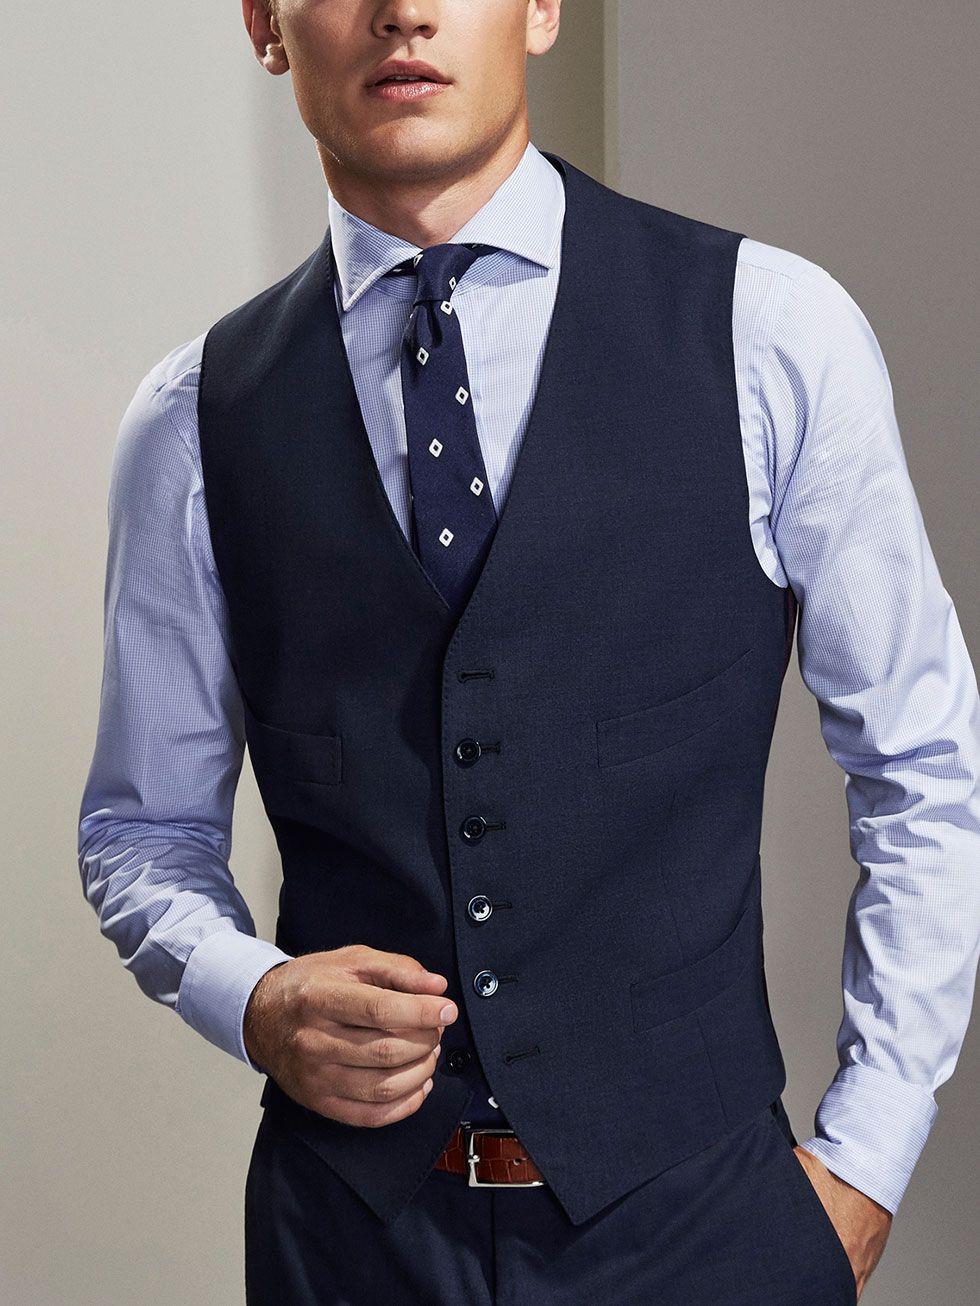 The Collection Personal Tailoring Hombre Massimo Dutti Espana Traje Azul Ropa Masculina Moda Hombre